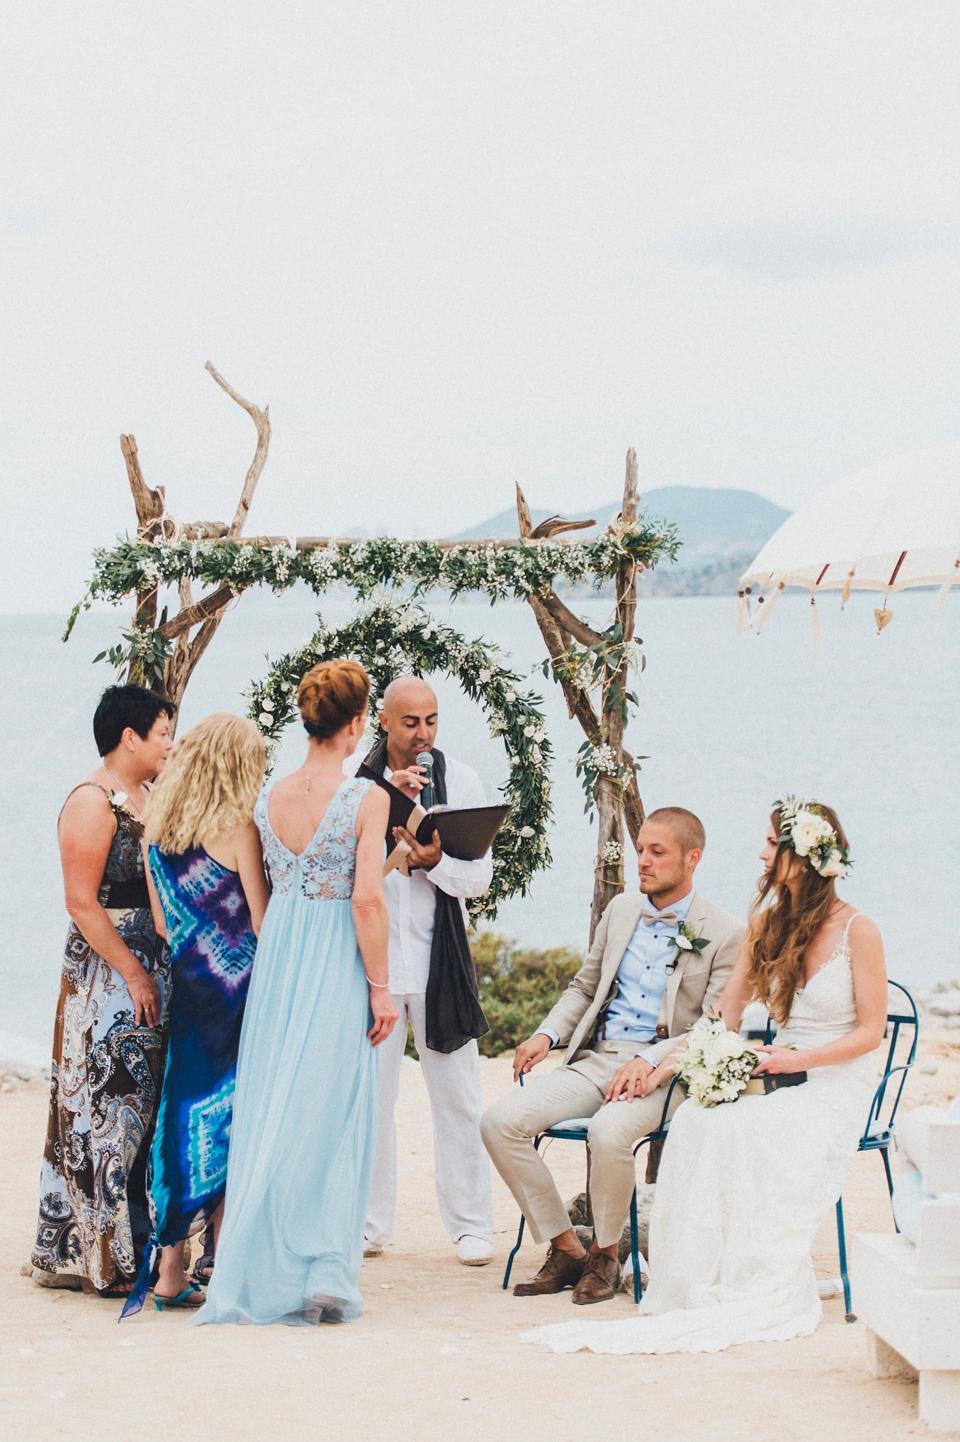 bohemian-ibiza-kreativ-wedding_0077 hochzeitsfotograf hochzeitsvideo ibiza bohemian weddingSaskia & Pierre Bohemian Bohemian Ibiza Weddingbohemian ibiza kreativ wedding 0077